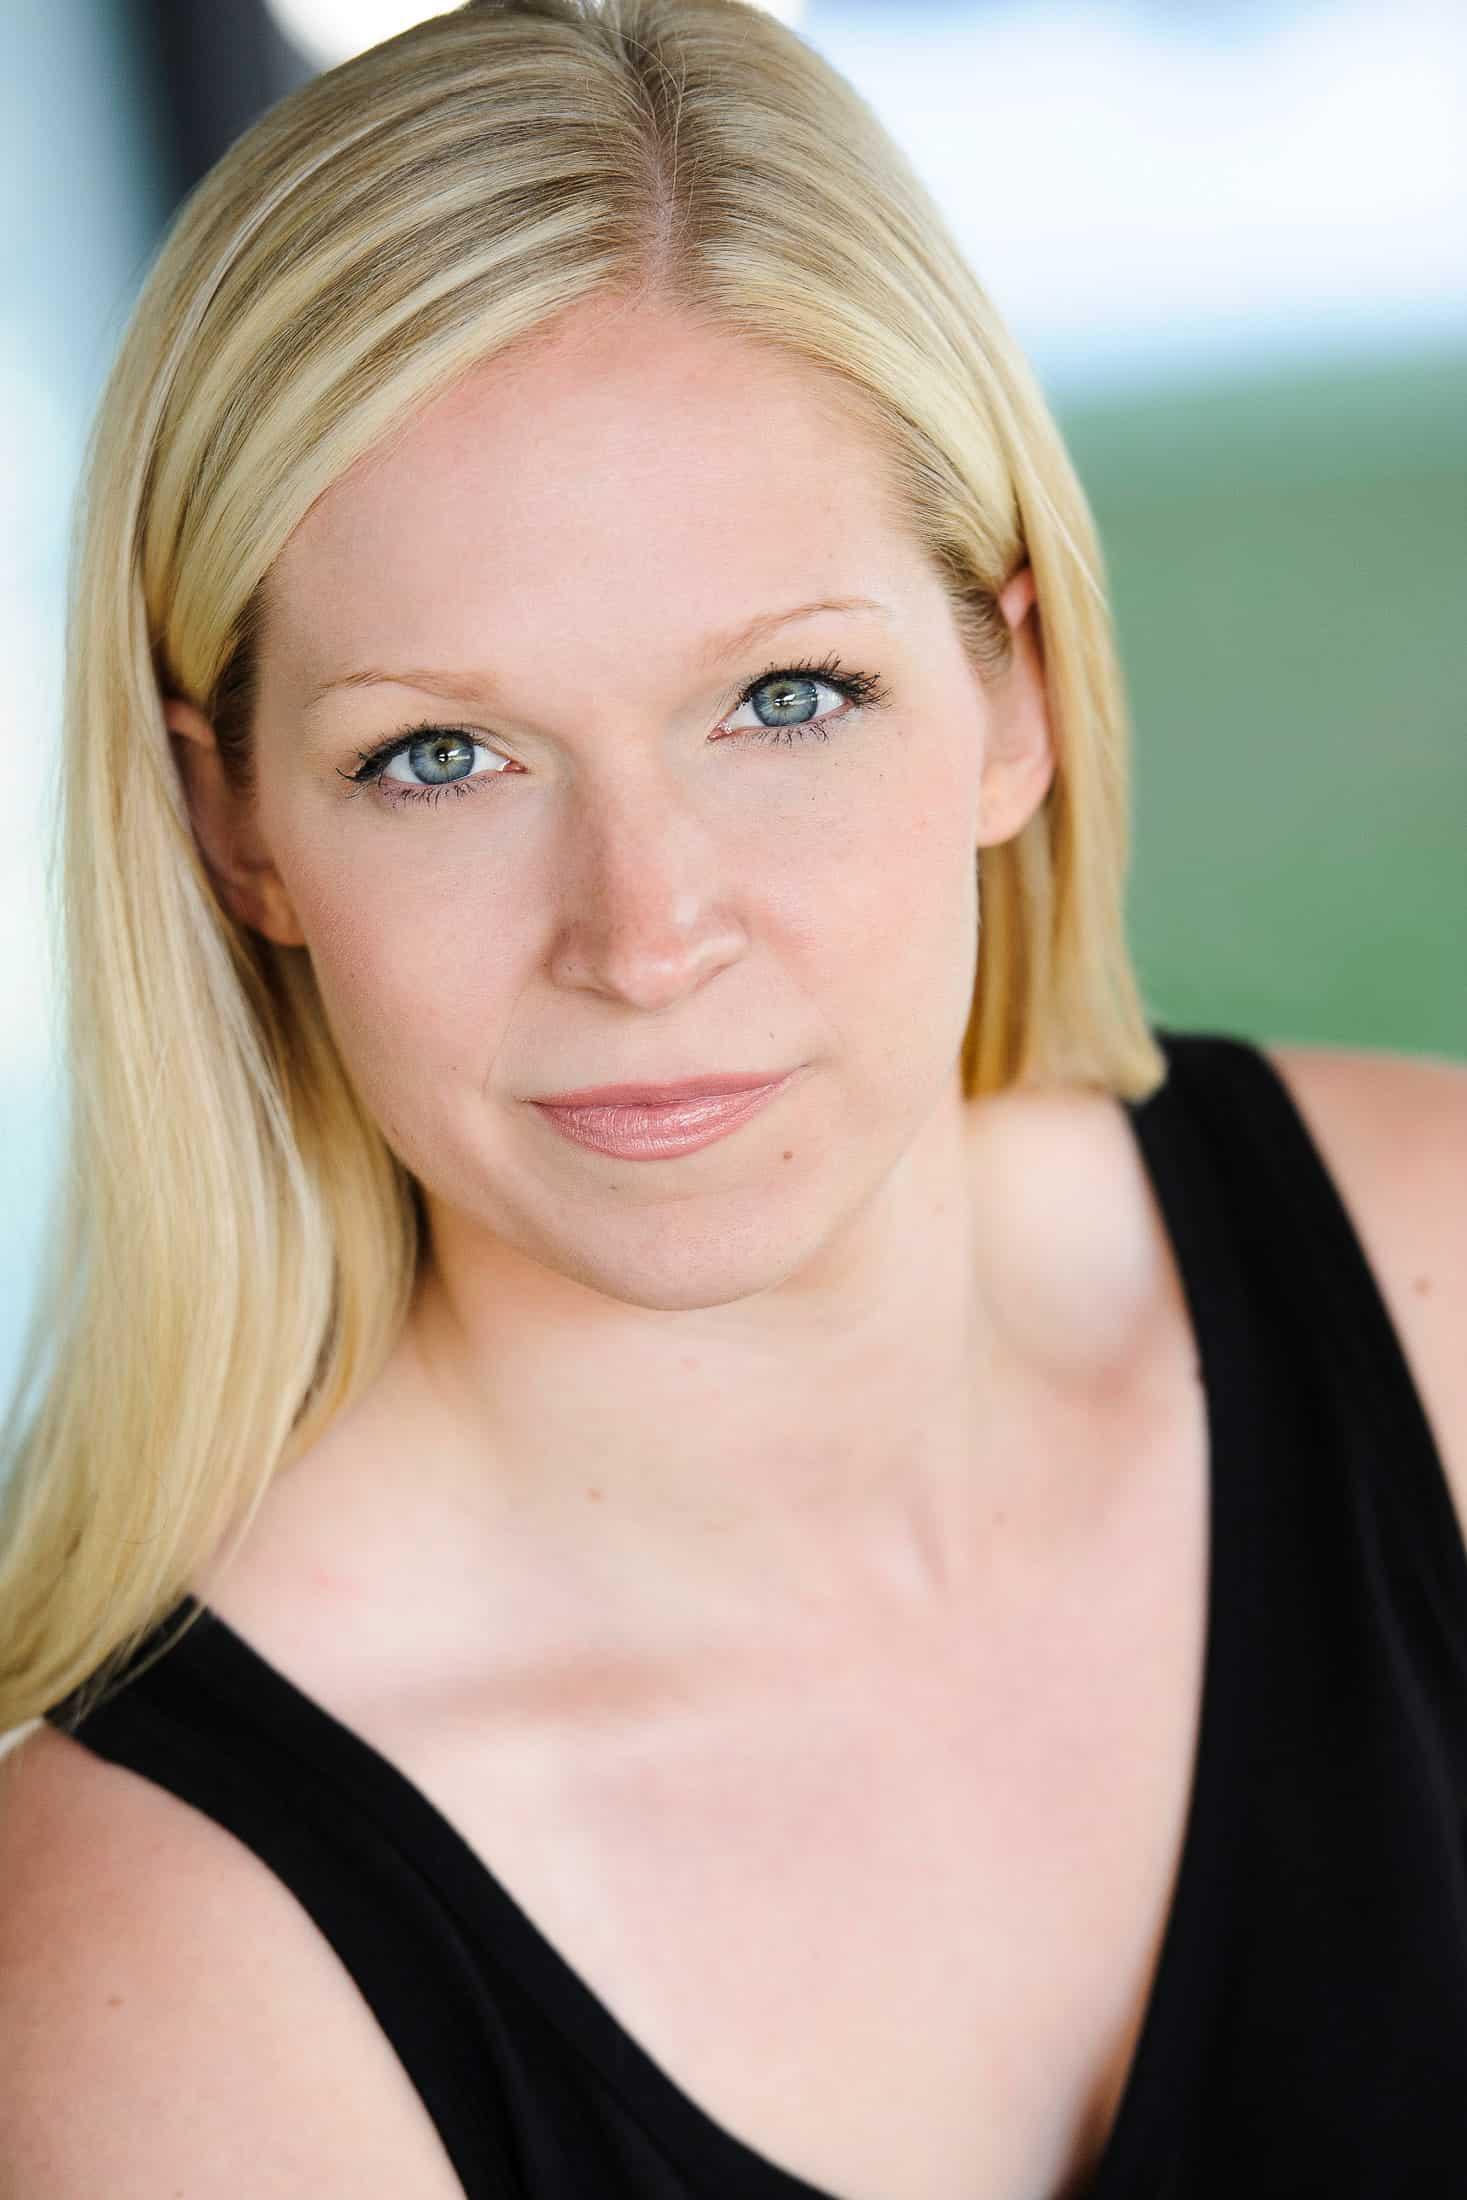 Headshots NYC - Actor Headshots Natalie G